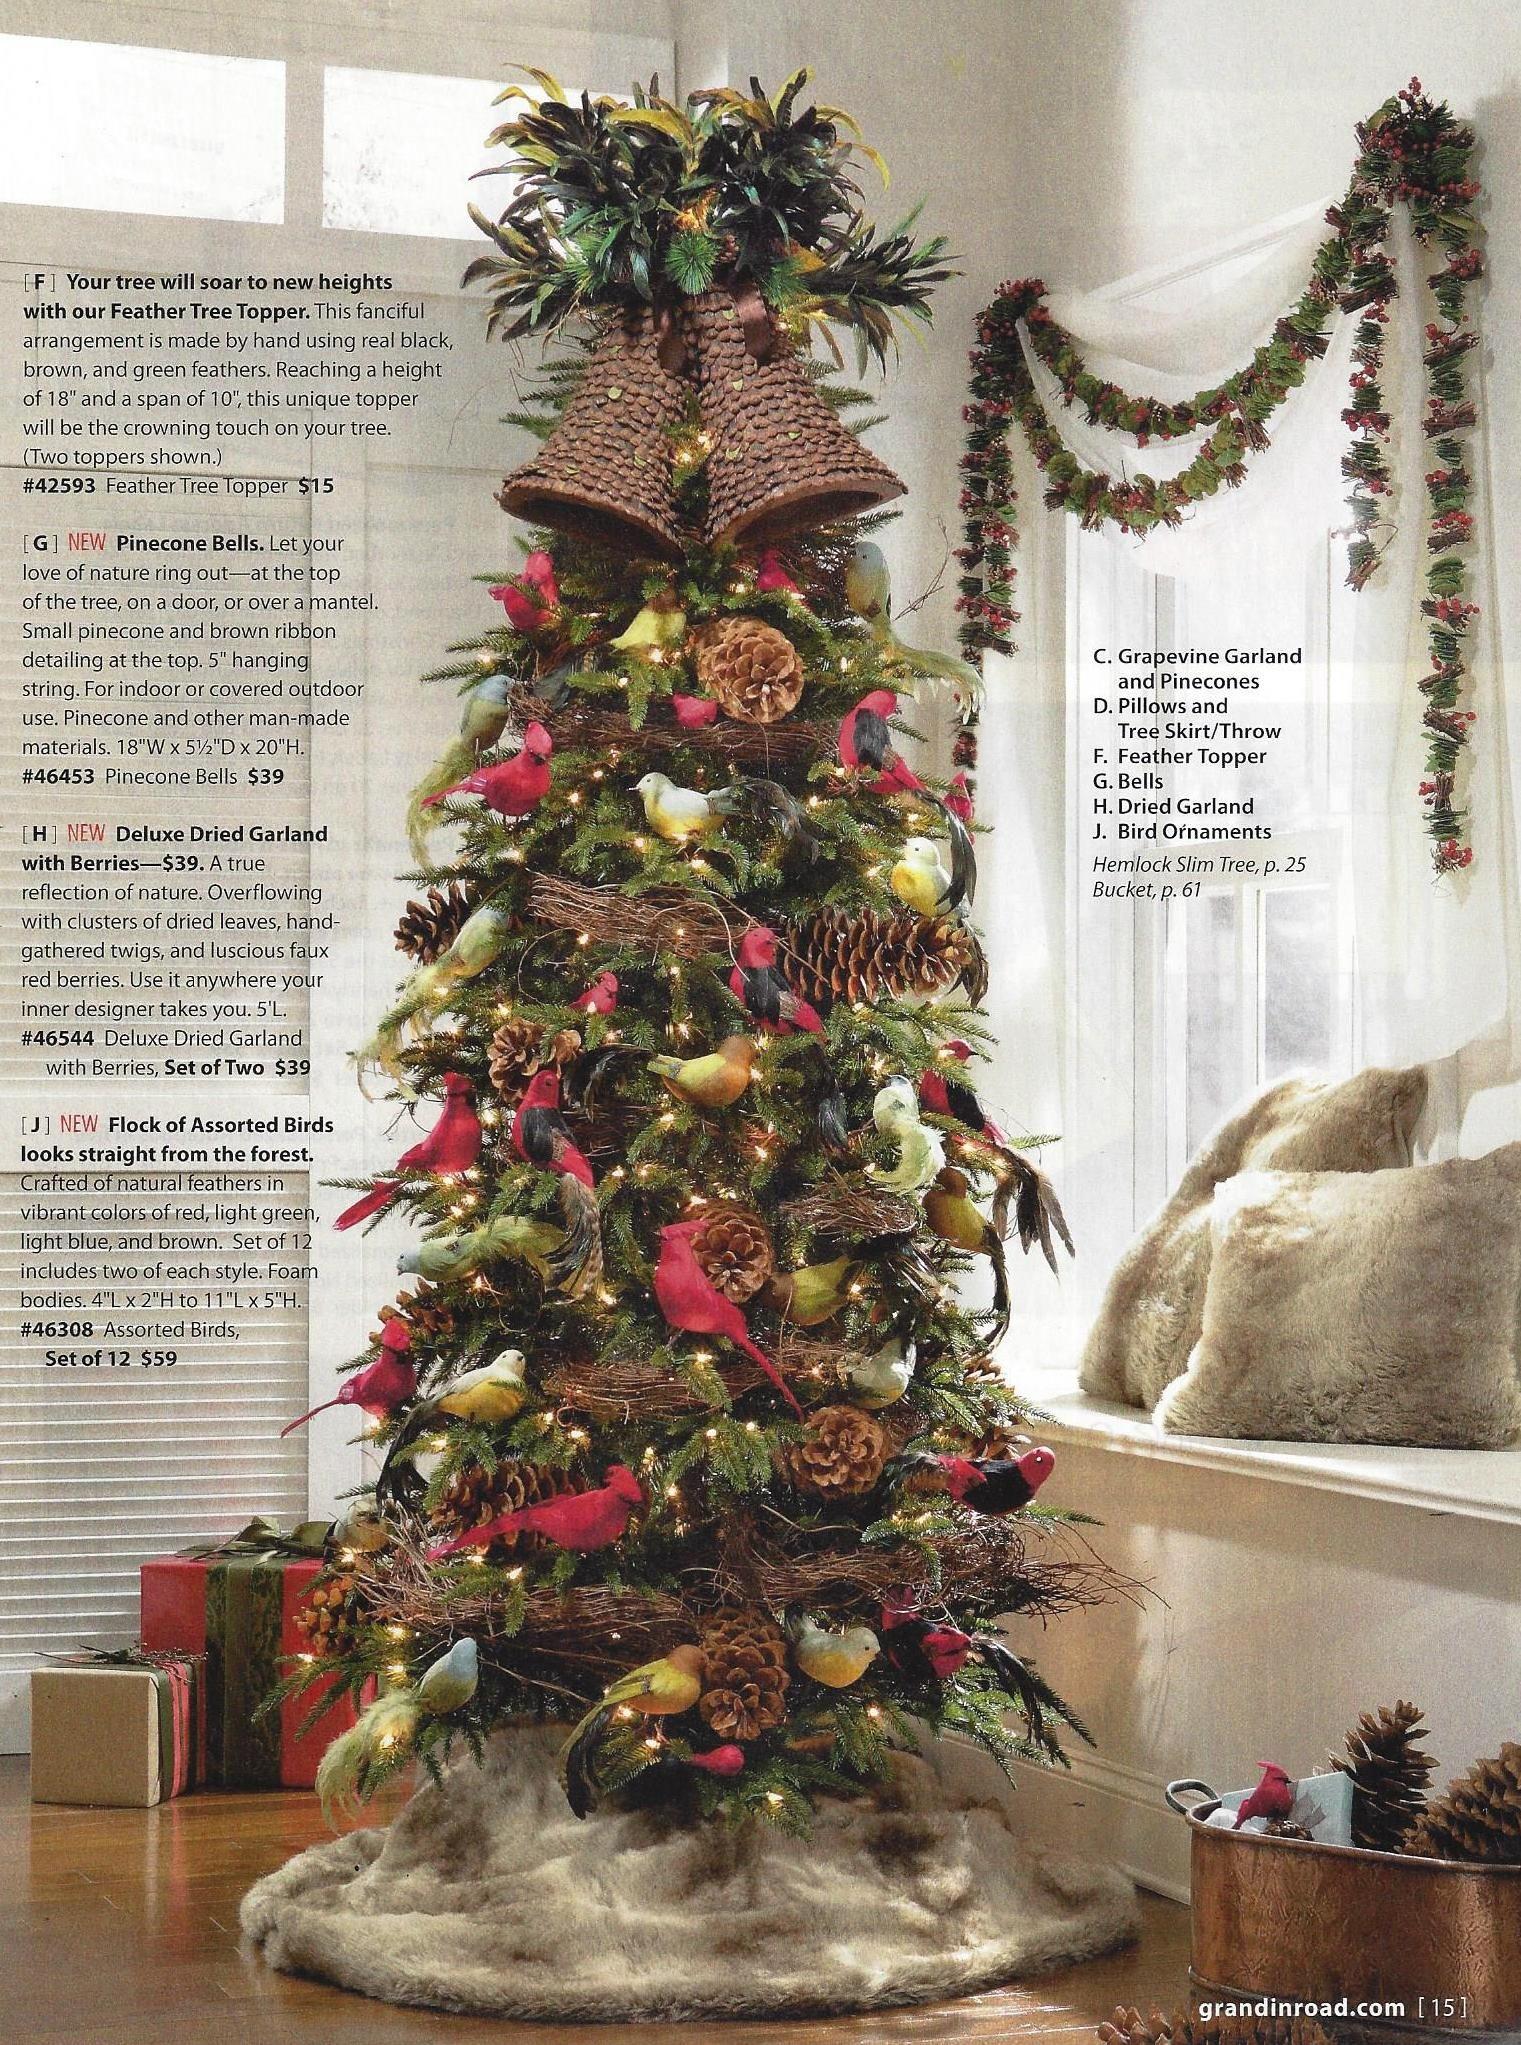 Cardinal Themed Christmas Tree Decorations Christmas Tree Themes Christmas Tree Decorations Cardinal Christmas Decor